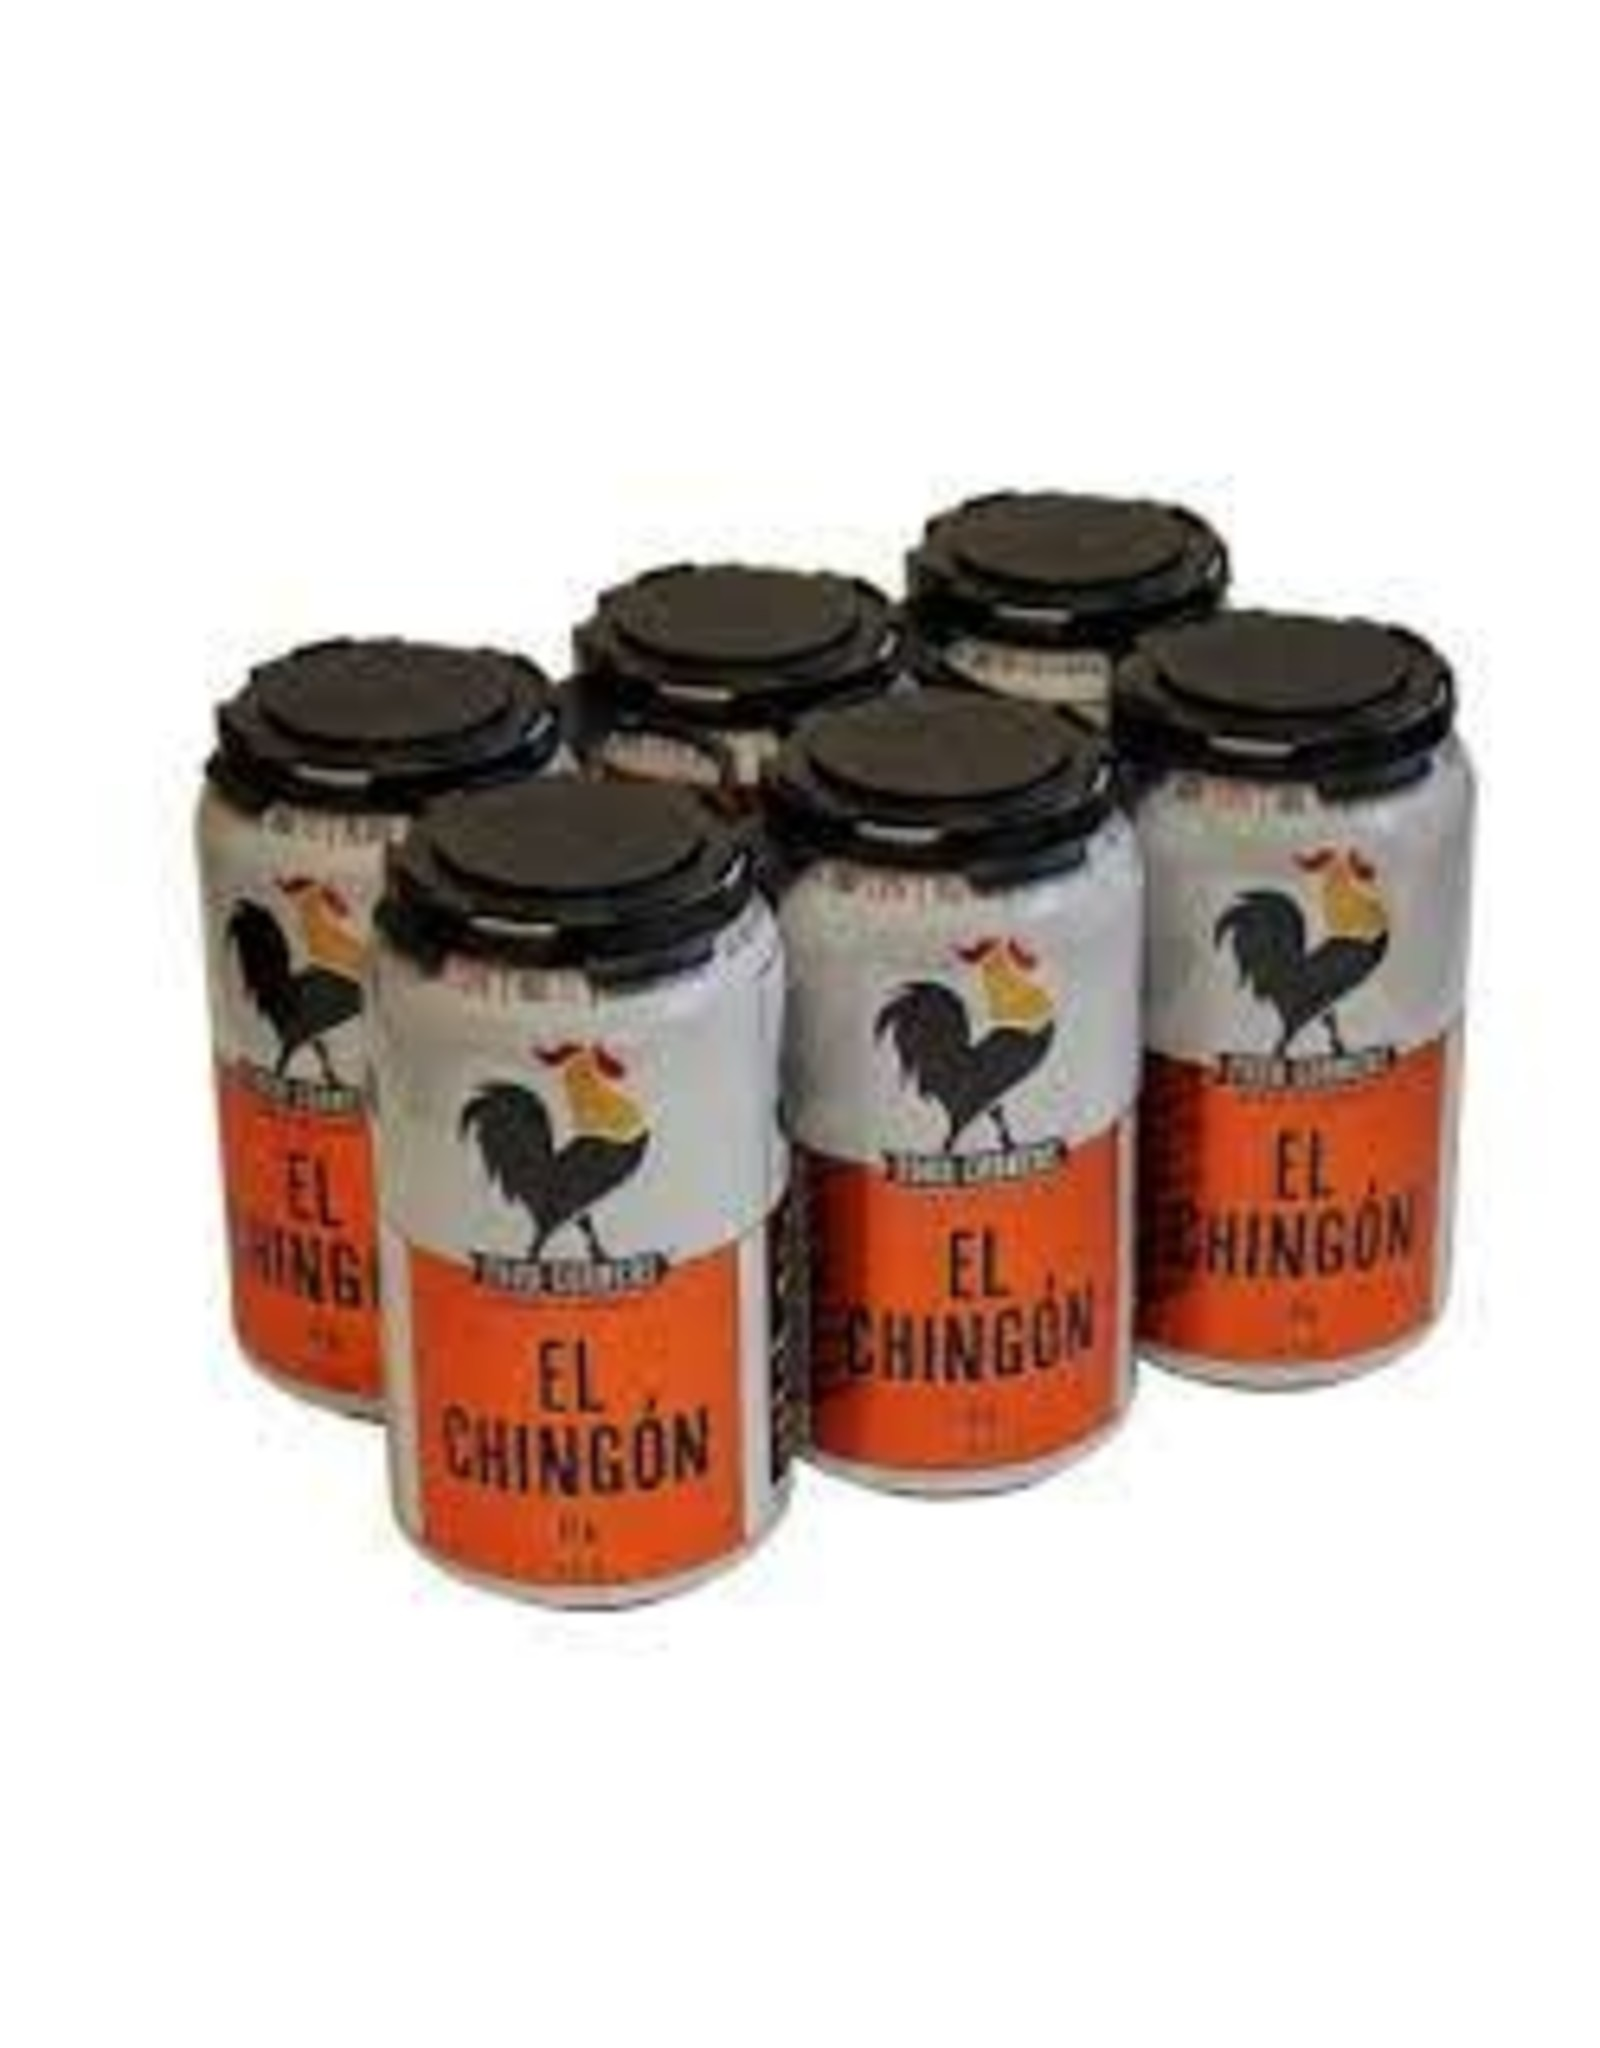 FOUR CORNERS EL CHINGON 4-6-12 CN